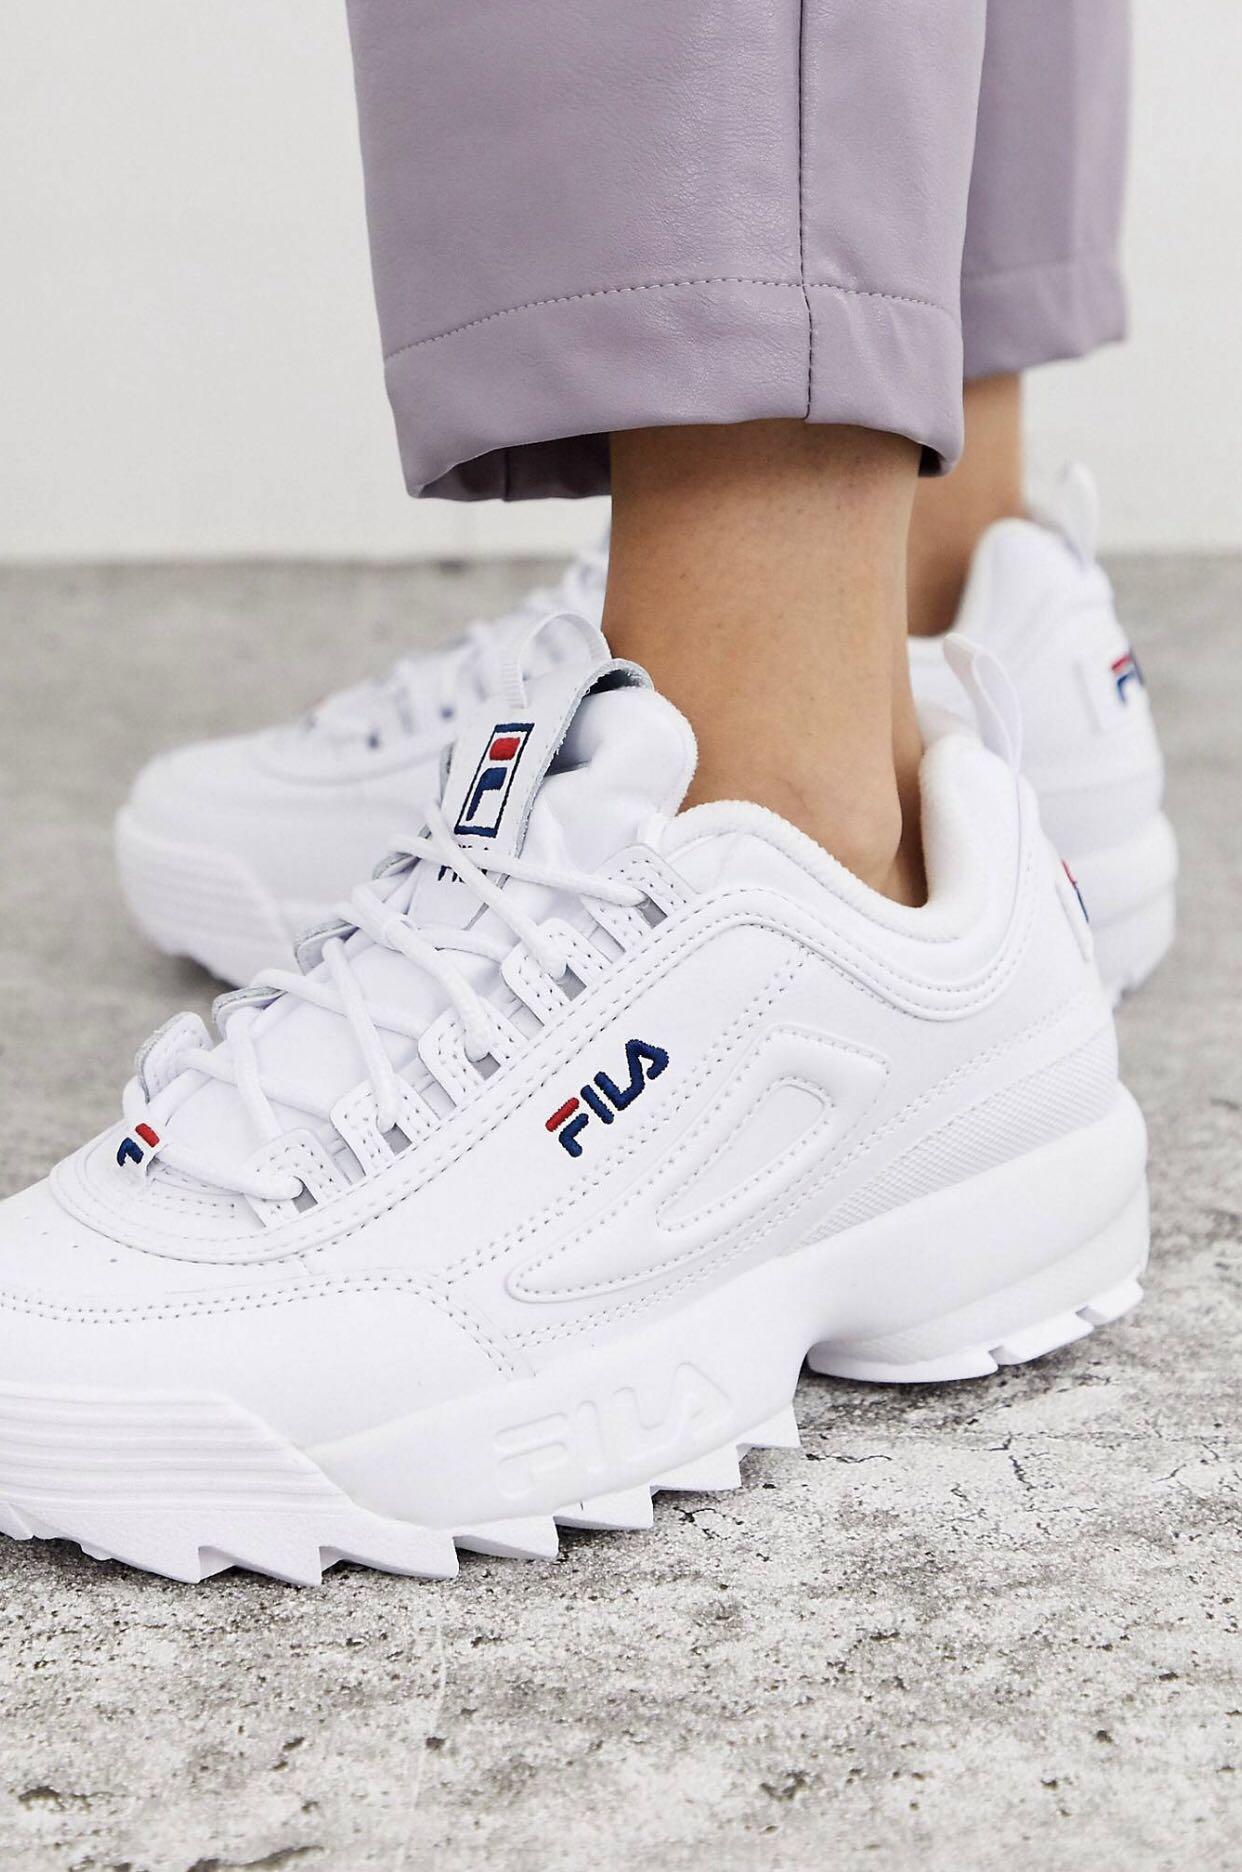 Fila Disruptor Trainers in white, Women